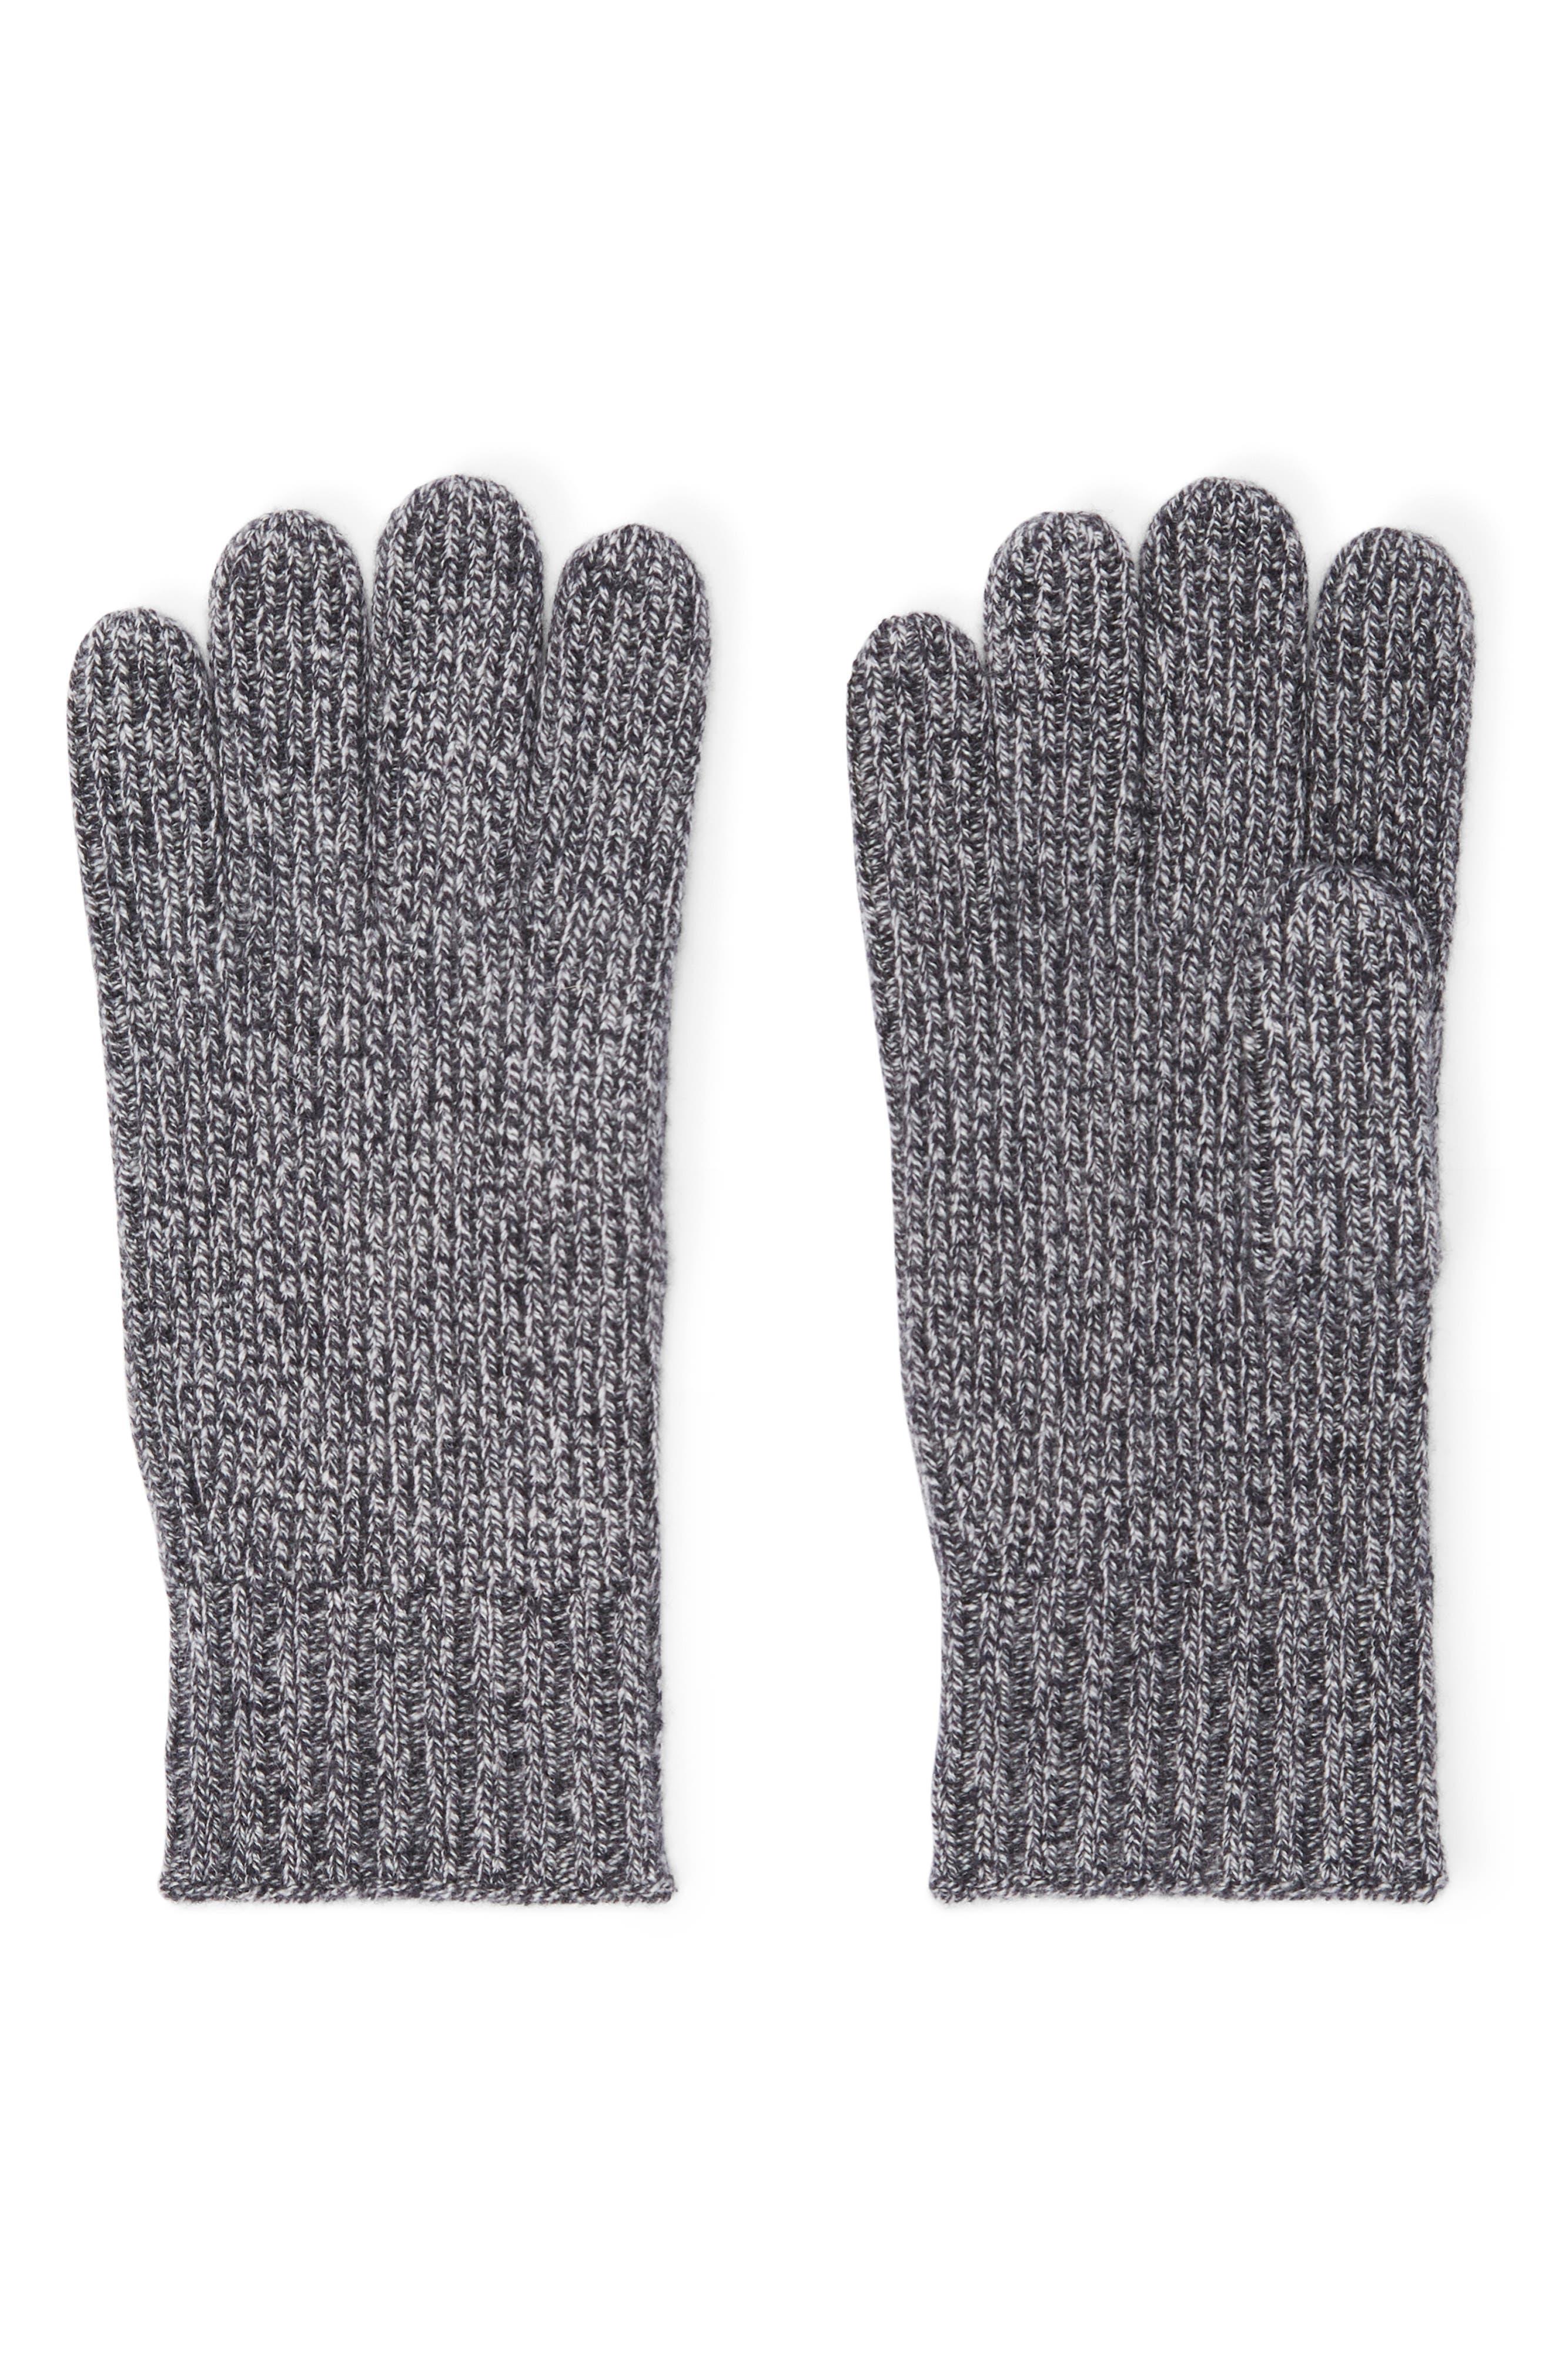 Kensington Cashmere Blend Gloves,                             Main thumbnail 1, color,                             SALT AND PEPPER MARL